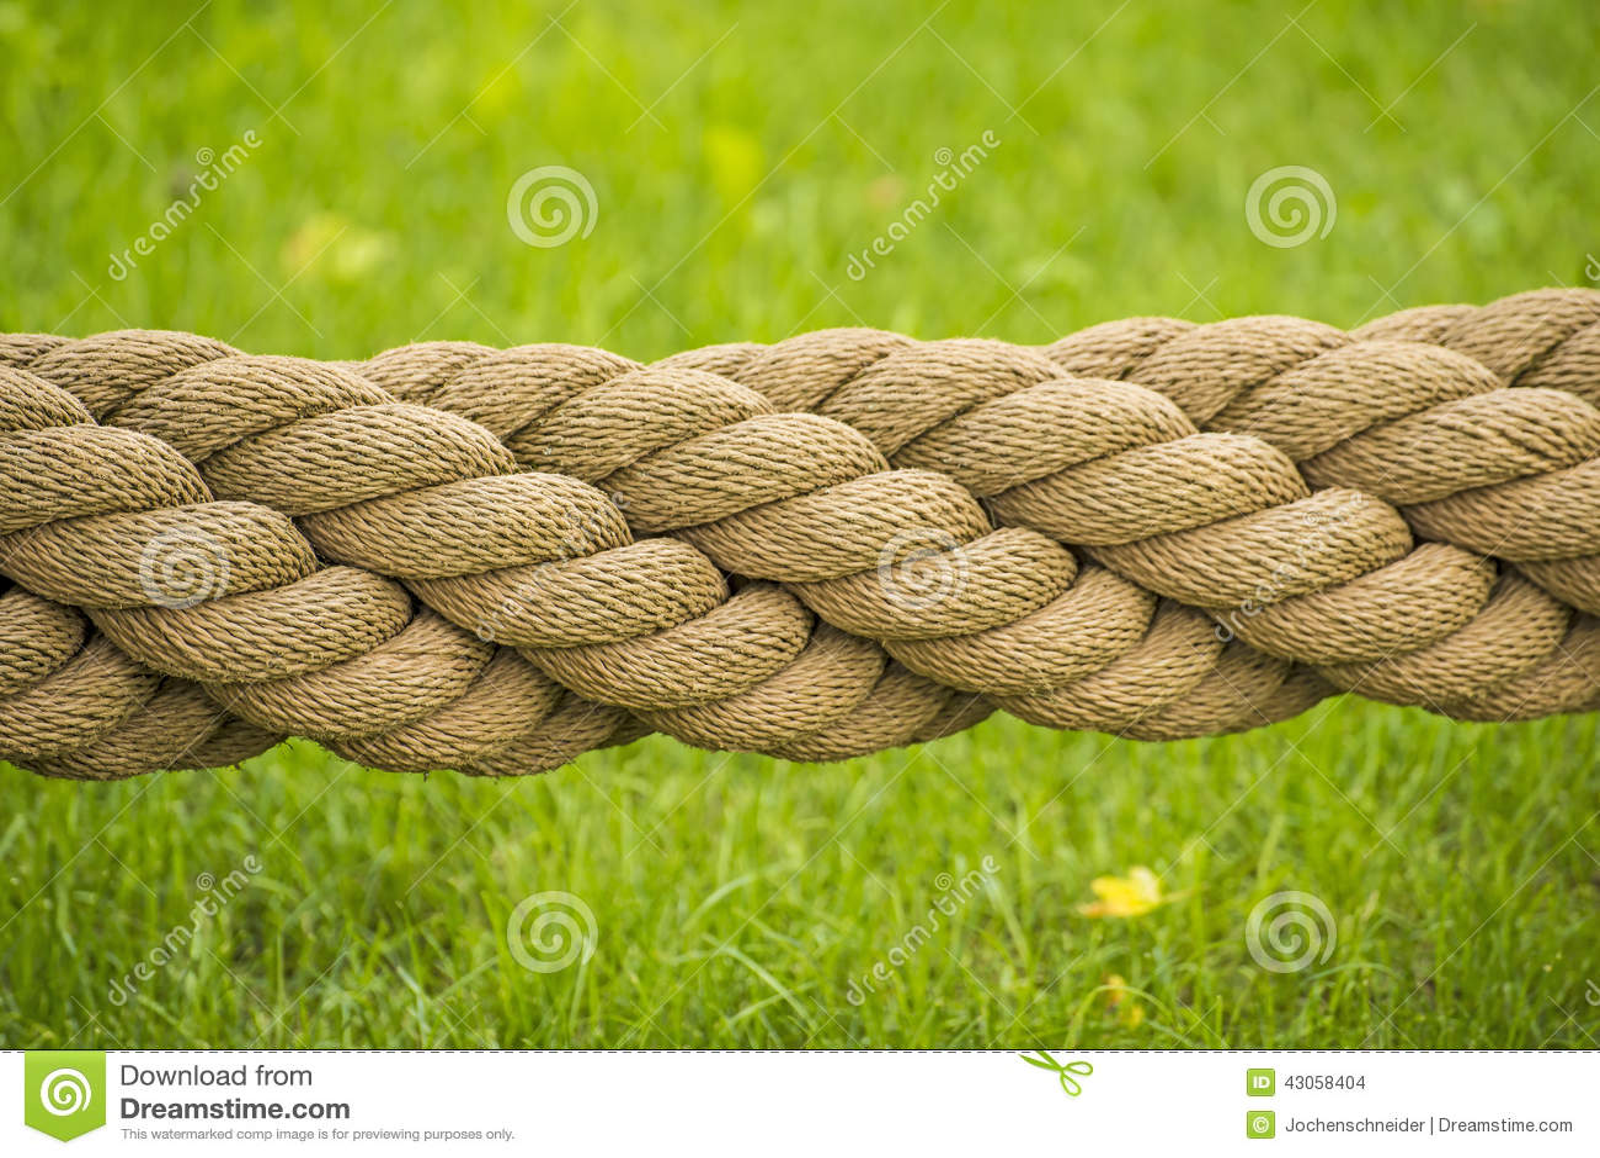 cuerda gruesa foto de archivo imagen de horizontal